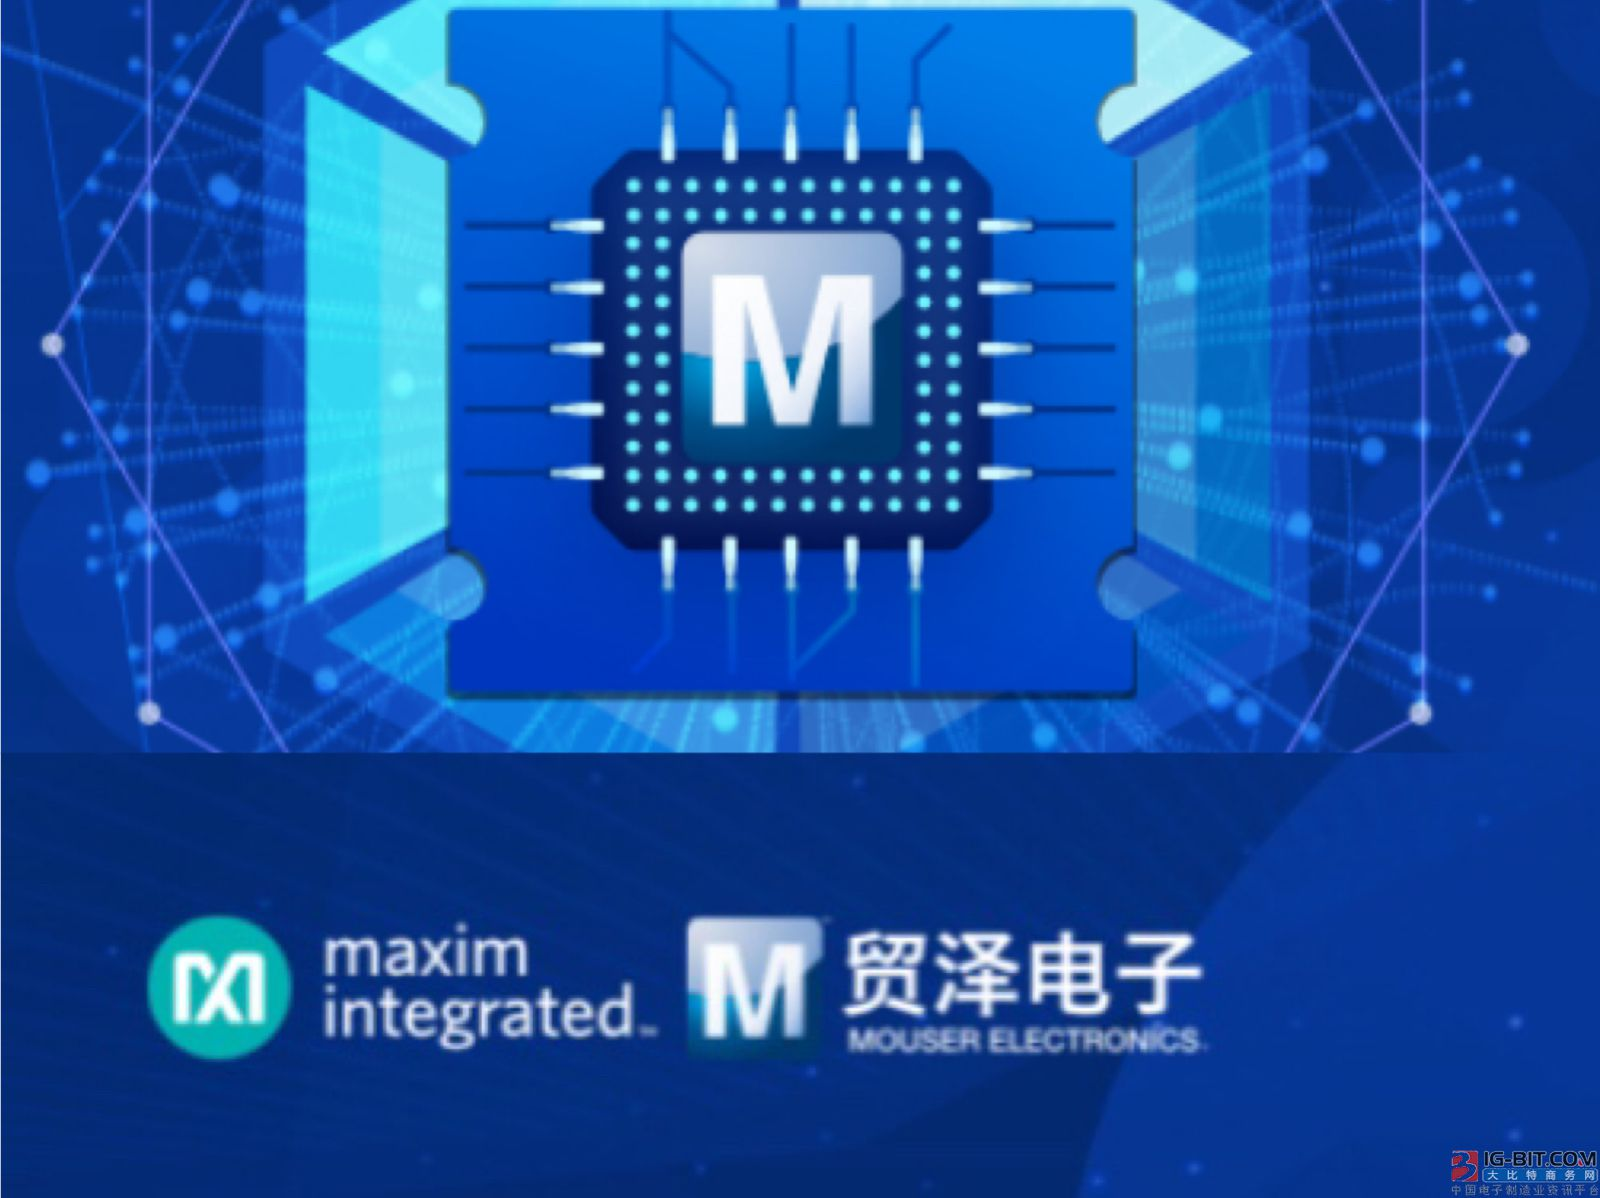 Maxim工业应用实战巡回研讨会